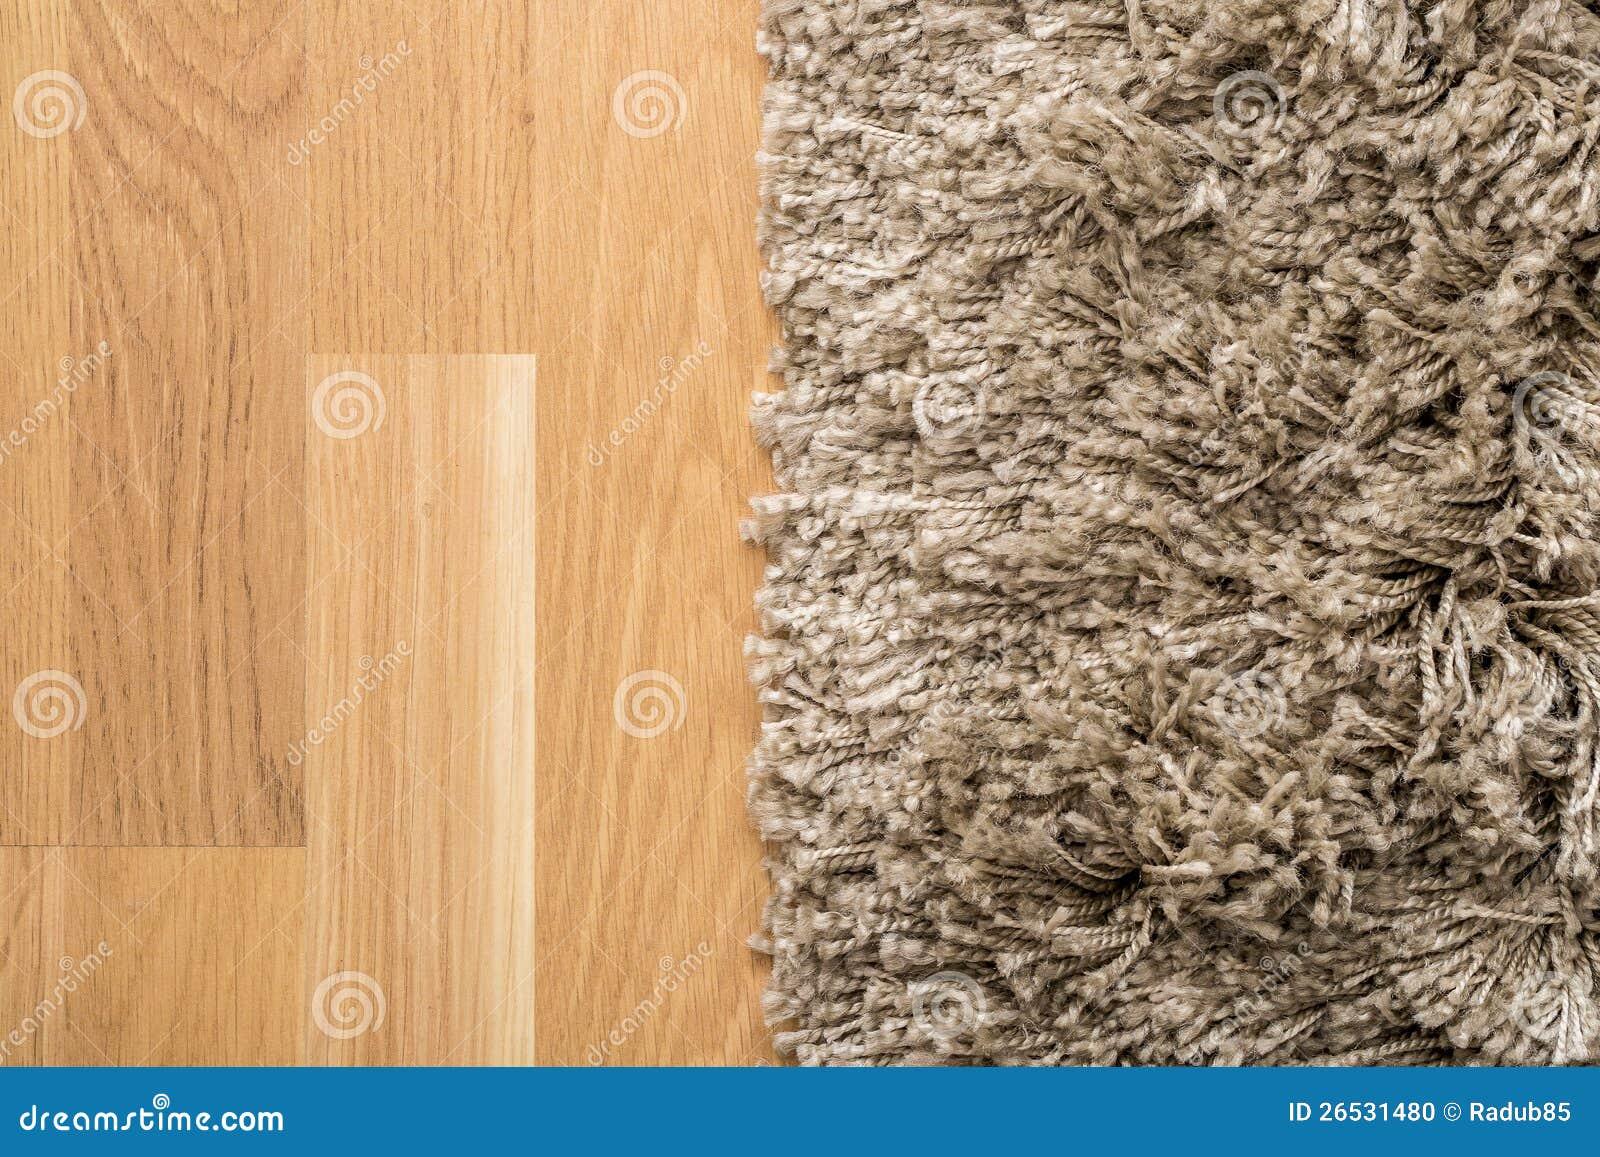 tapis et parquet photo stock image 26531480. Black Bedroom Furniture Sets. Home Design Ideas